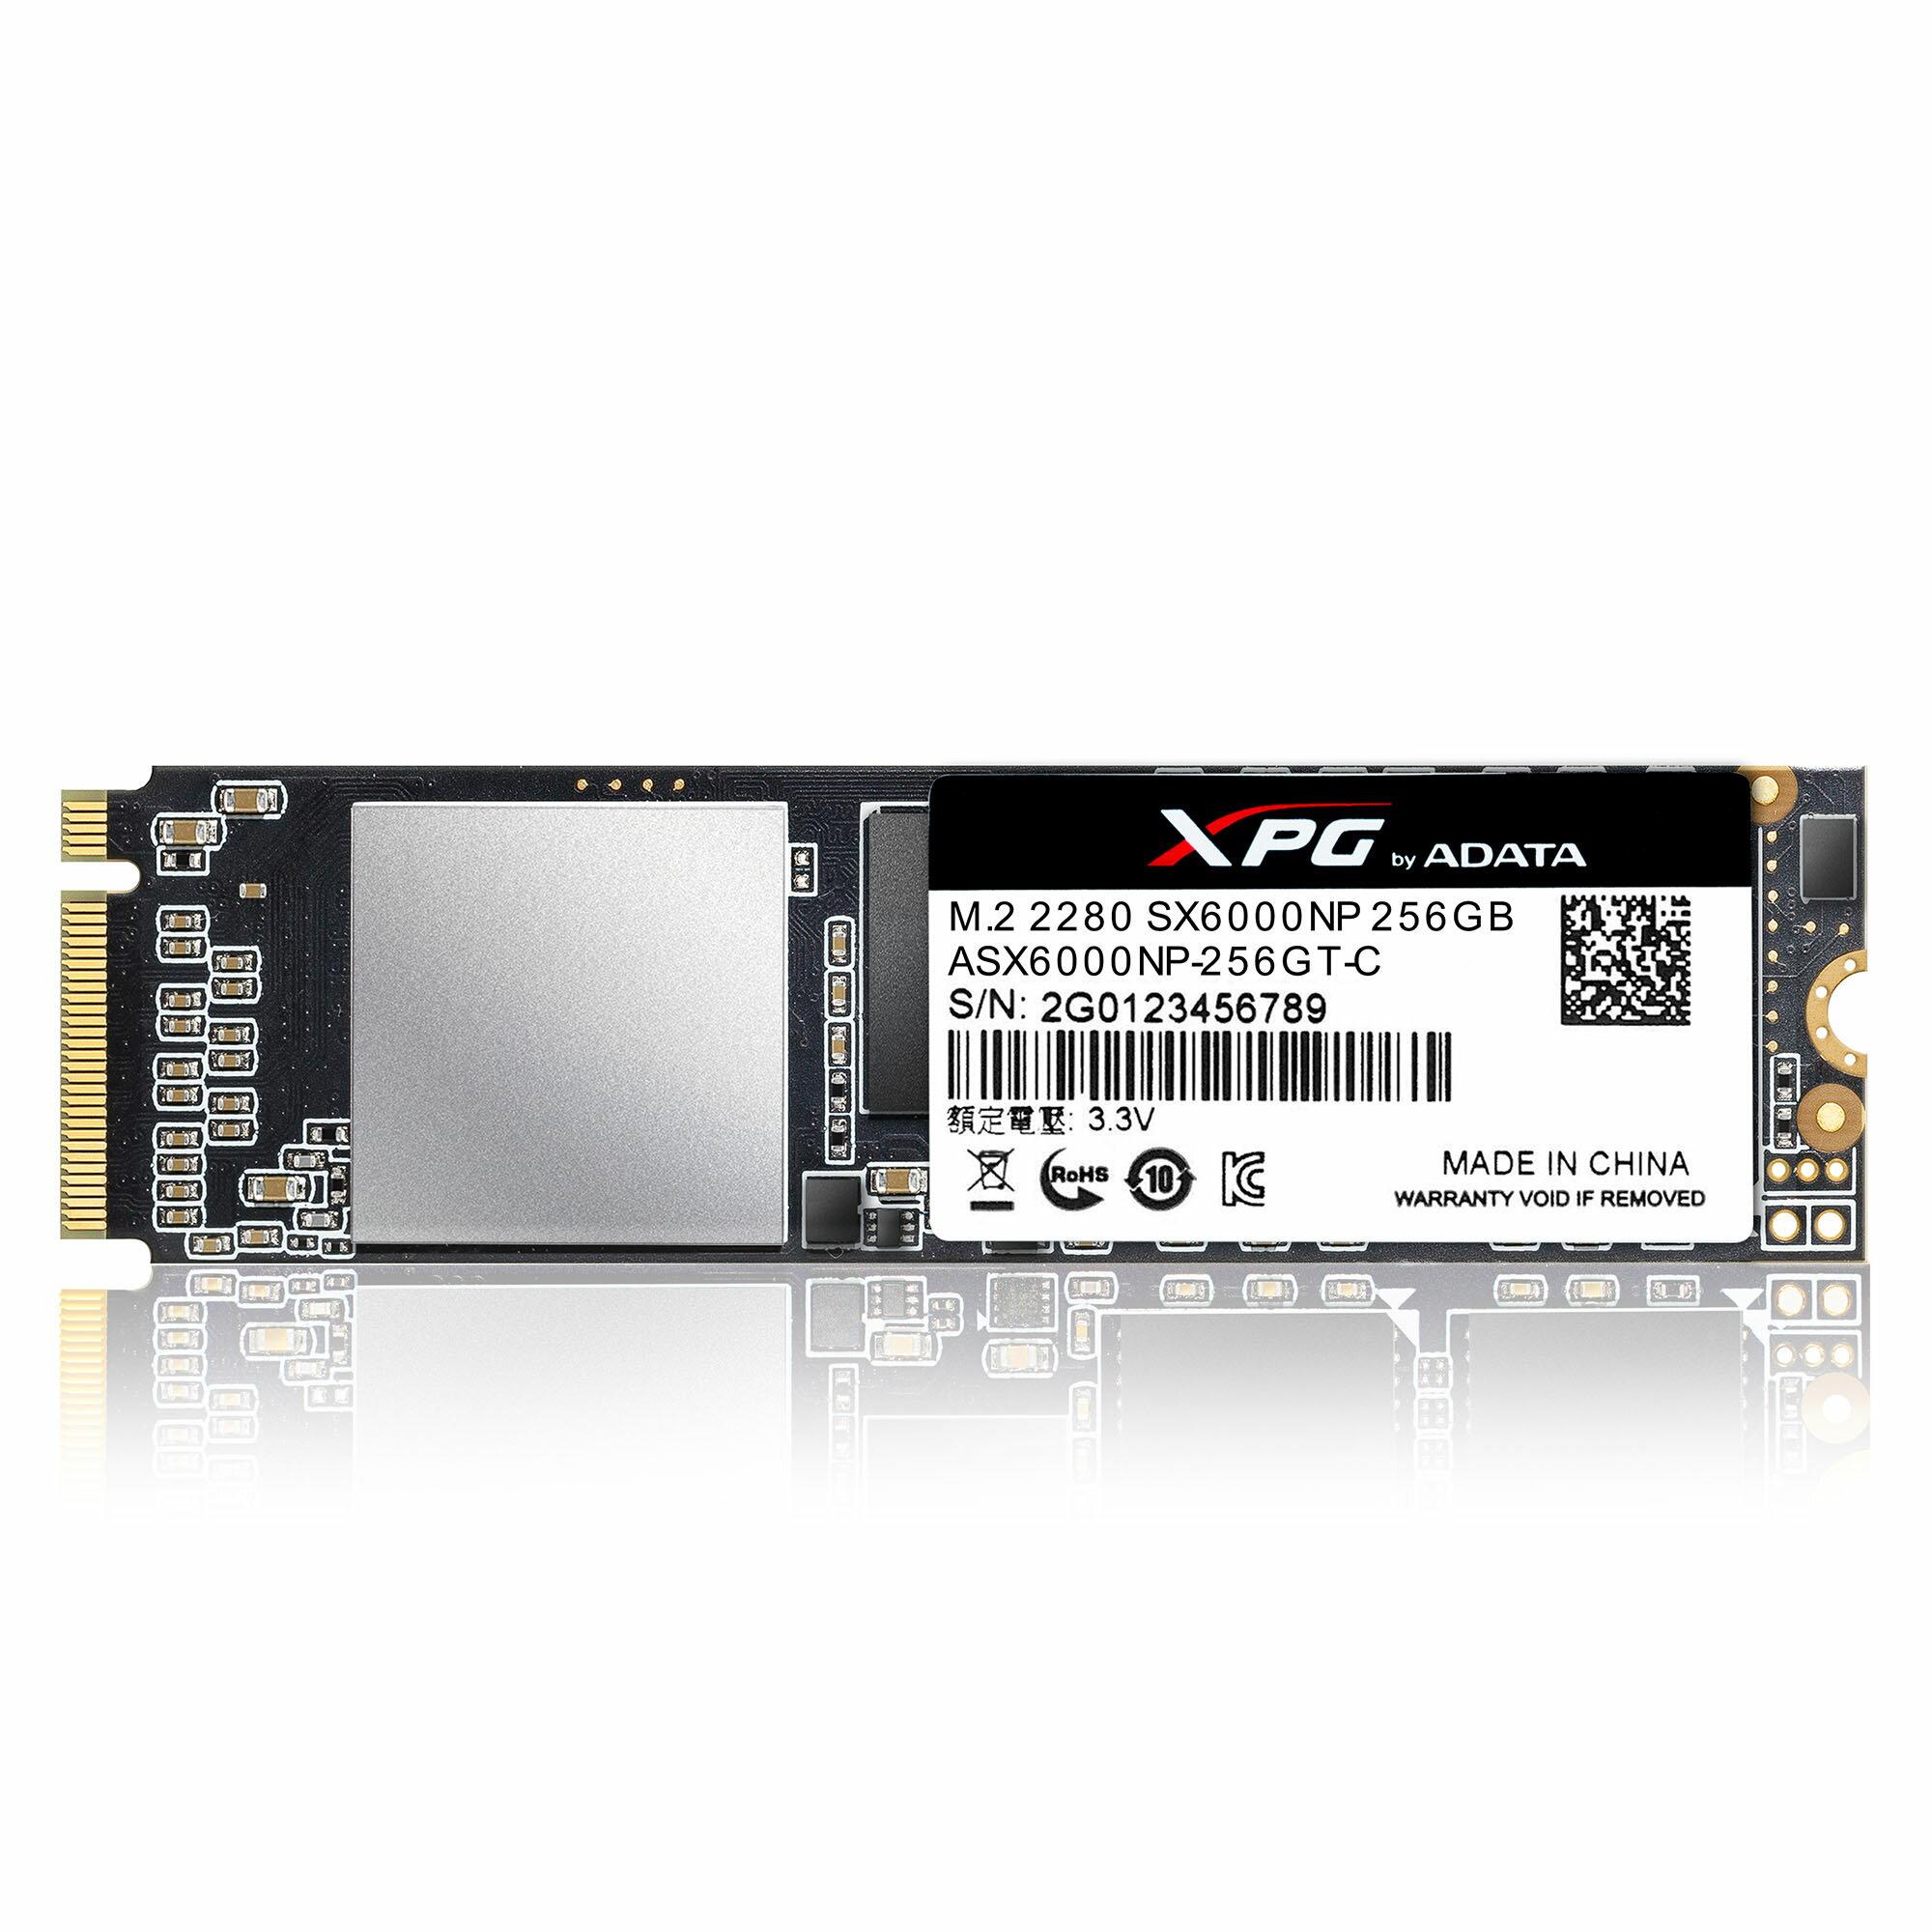 XPG SX6000 PCIe Gen3x2 M.2 2280 256GB SSD by ADATA with DIY XPG Heatsink 5